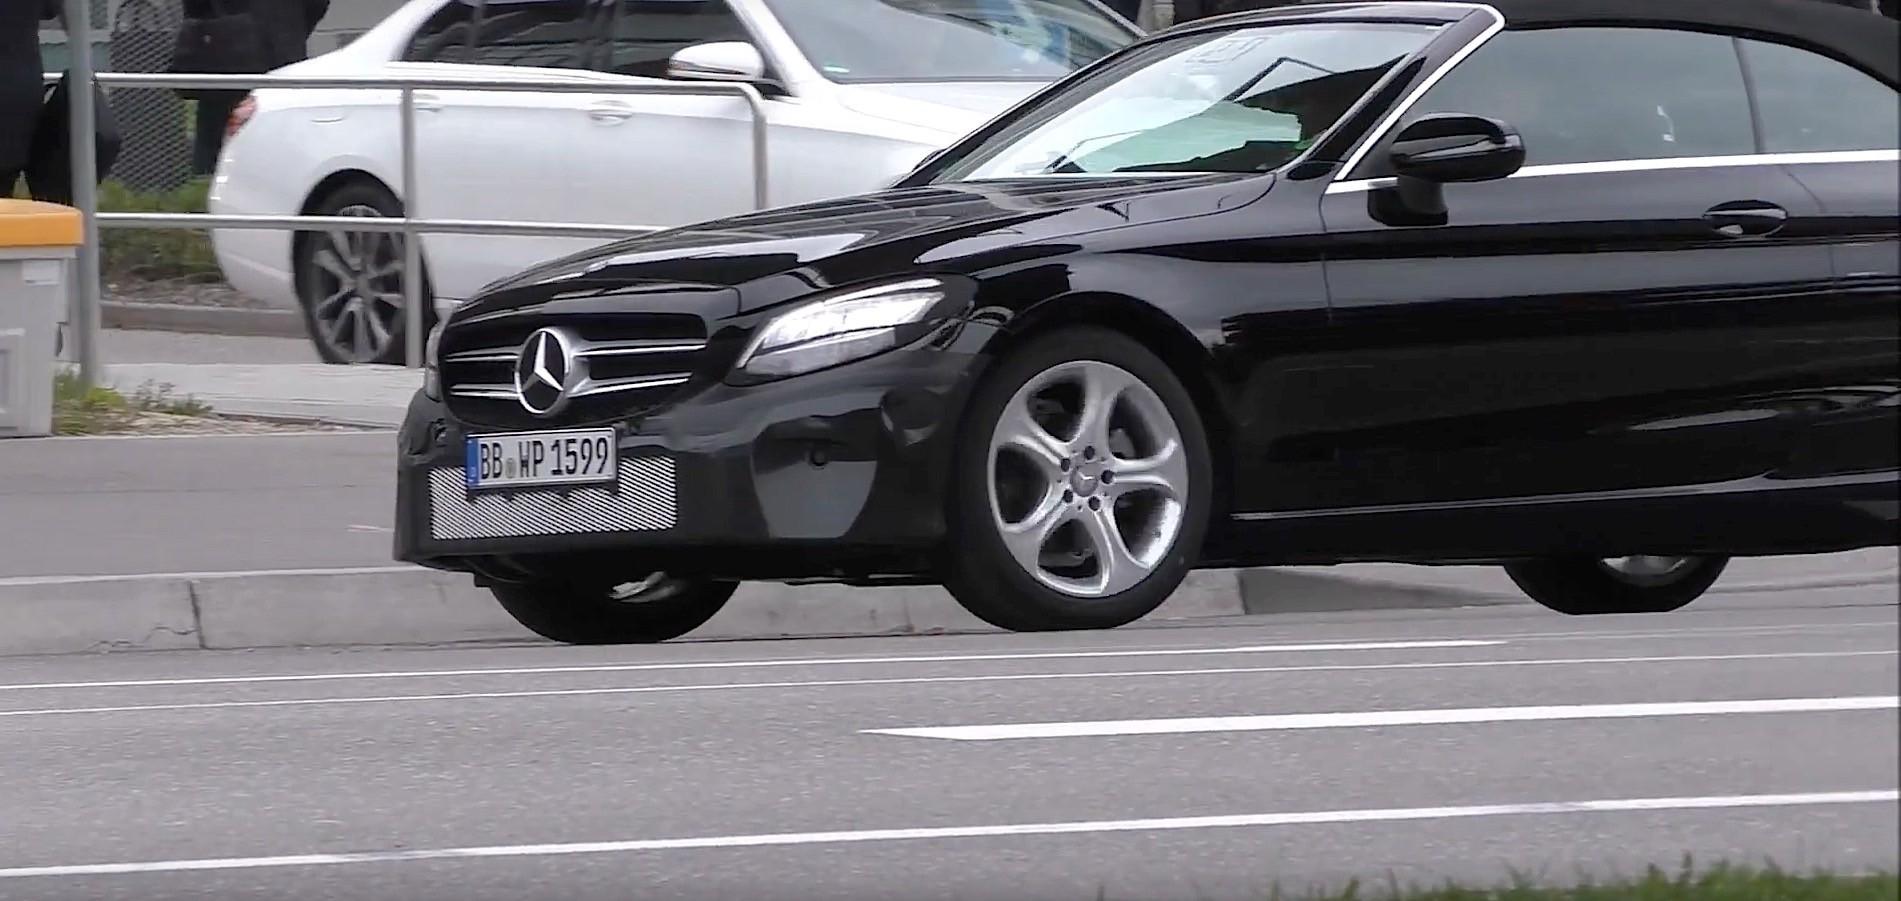 2019 Mercedes-Benz C-Class Cabrio Facelift Flaunts New Multi